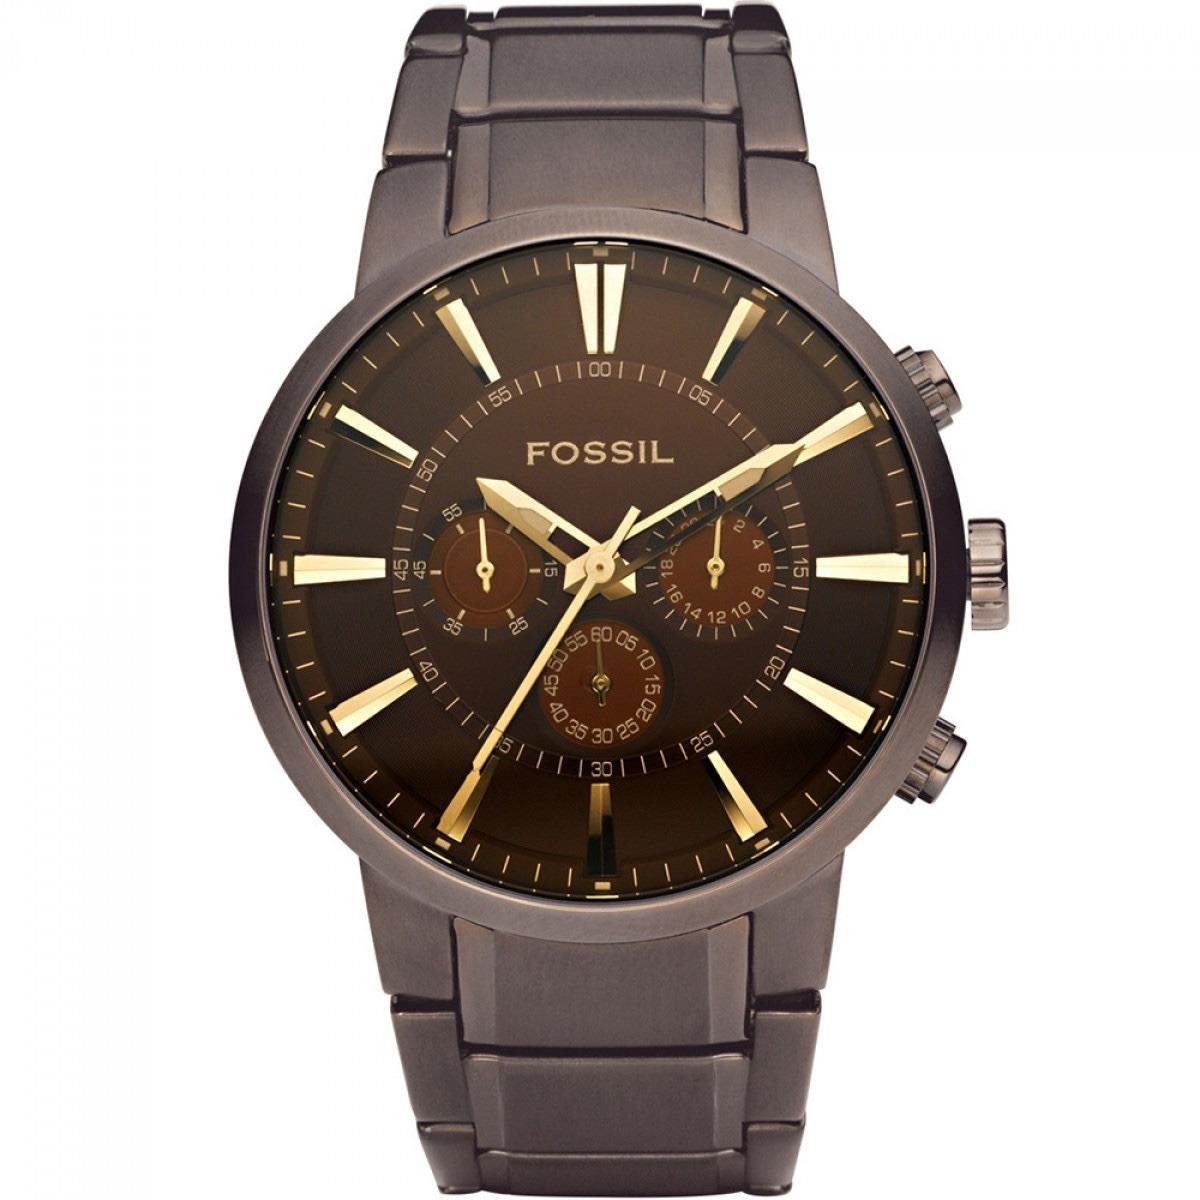 relogio fossil masculino dress chronograph ffs4357z loja. Carregando zoom. afea890215